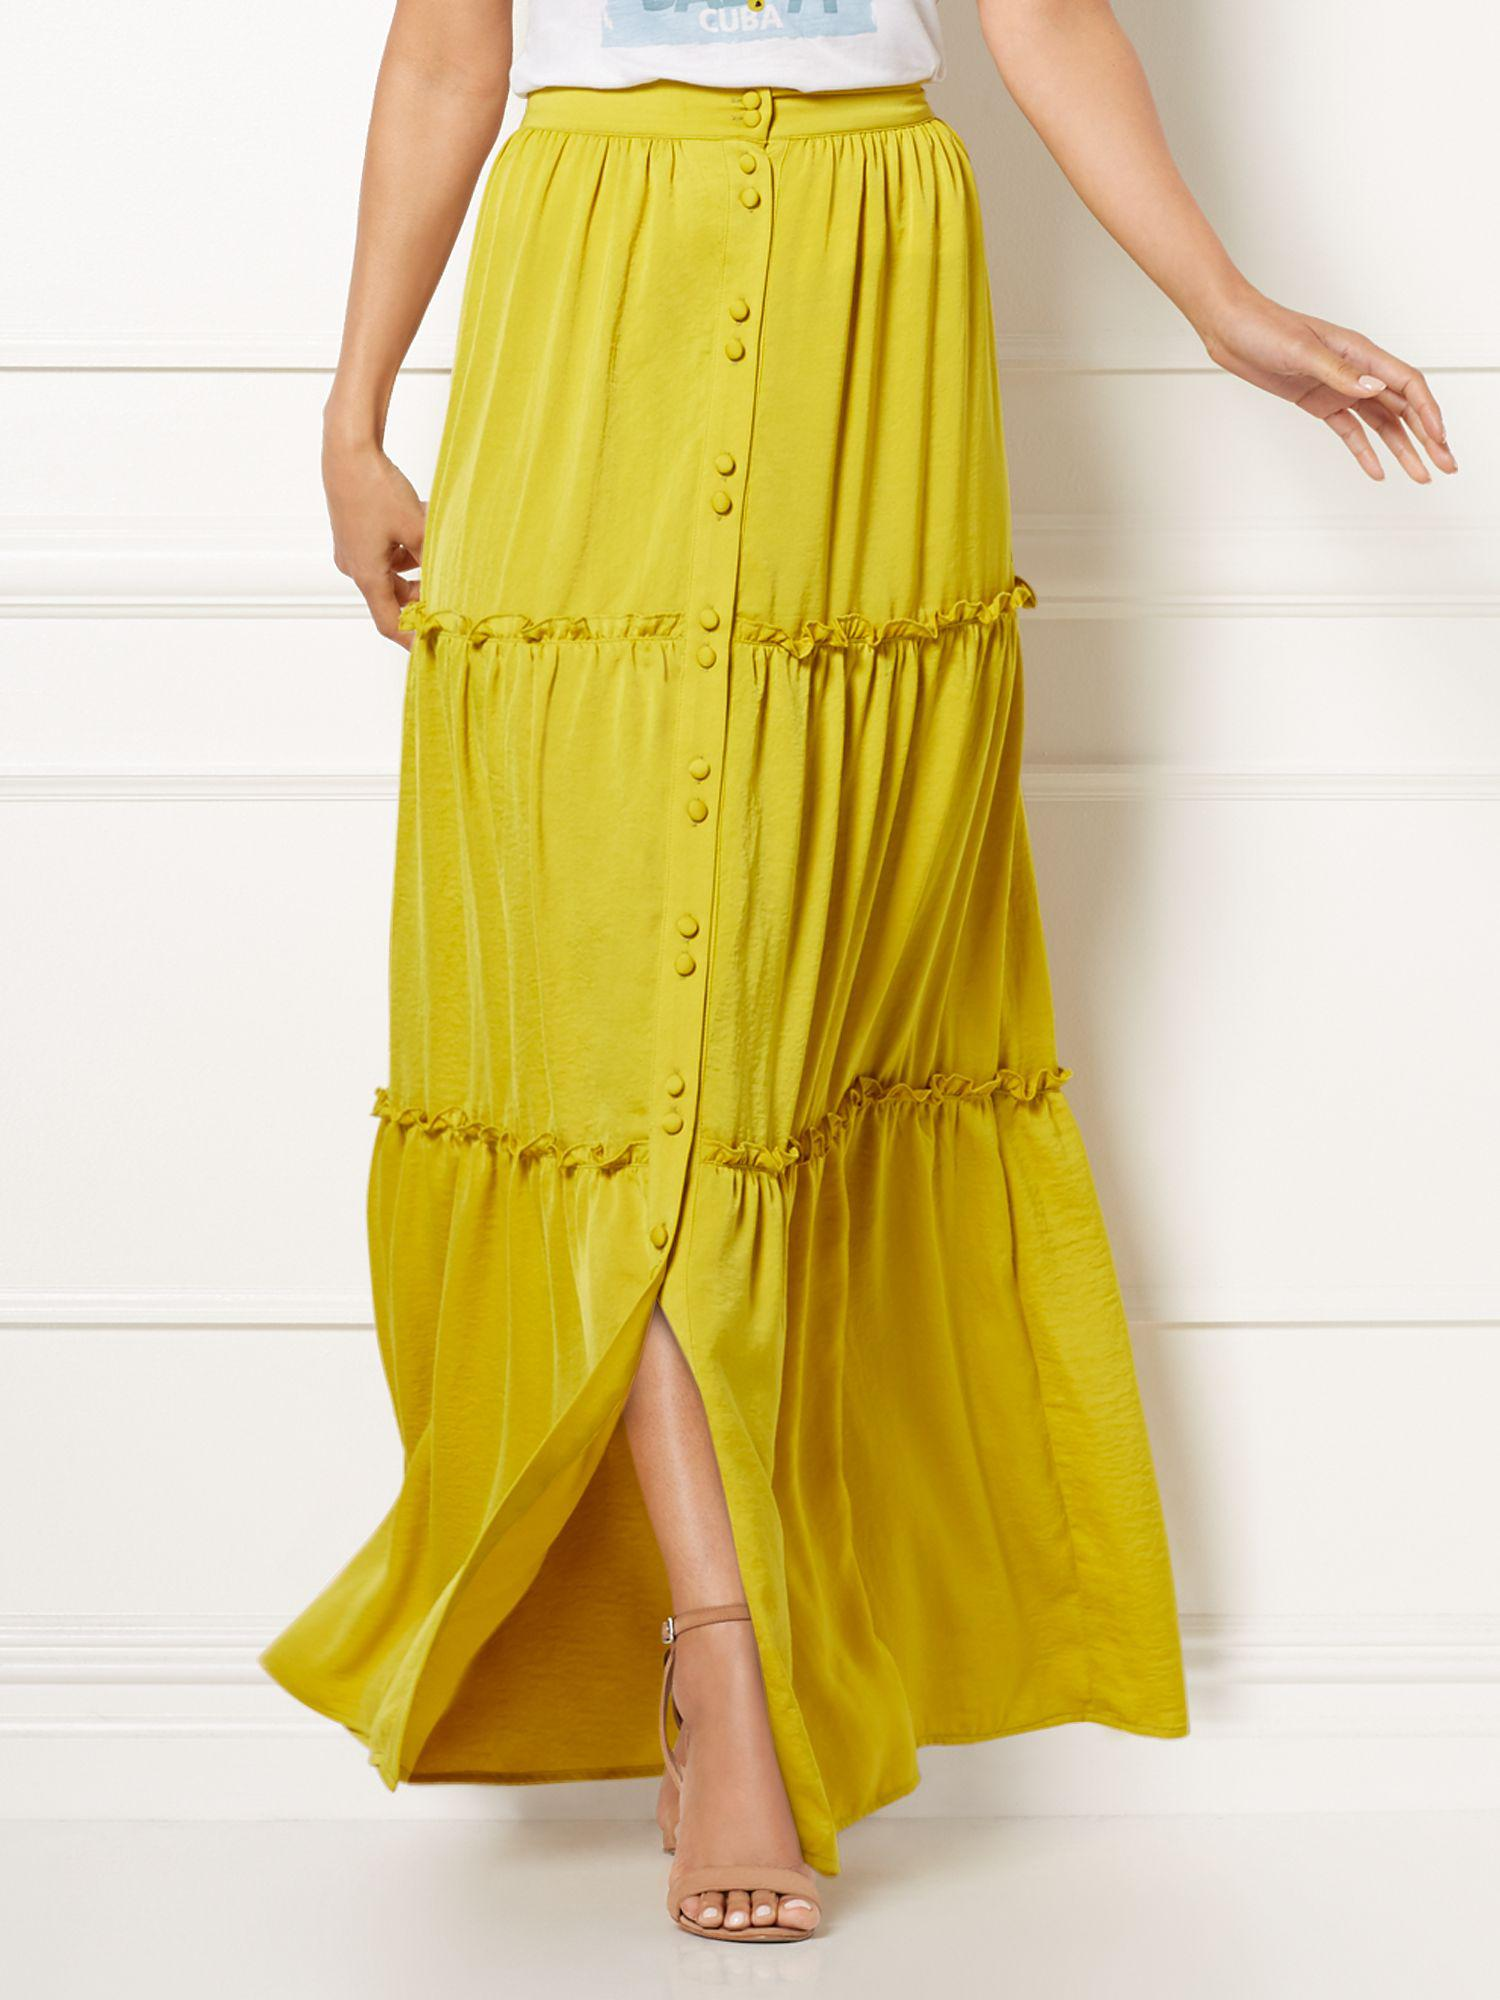 58704f5157747 Lyst - New York   Company Eva Mendes Collection - Sasha Maxi Skirt ...